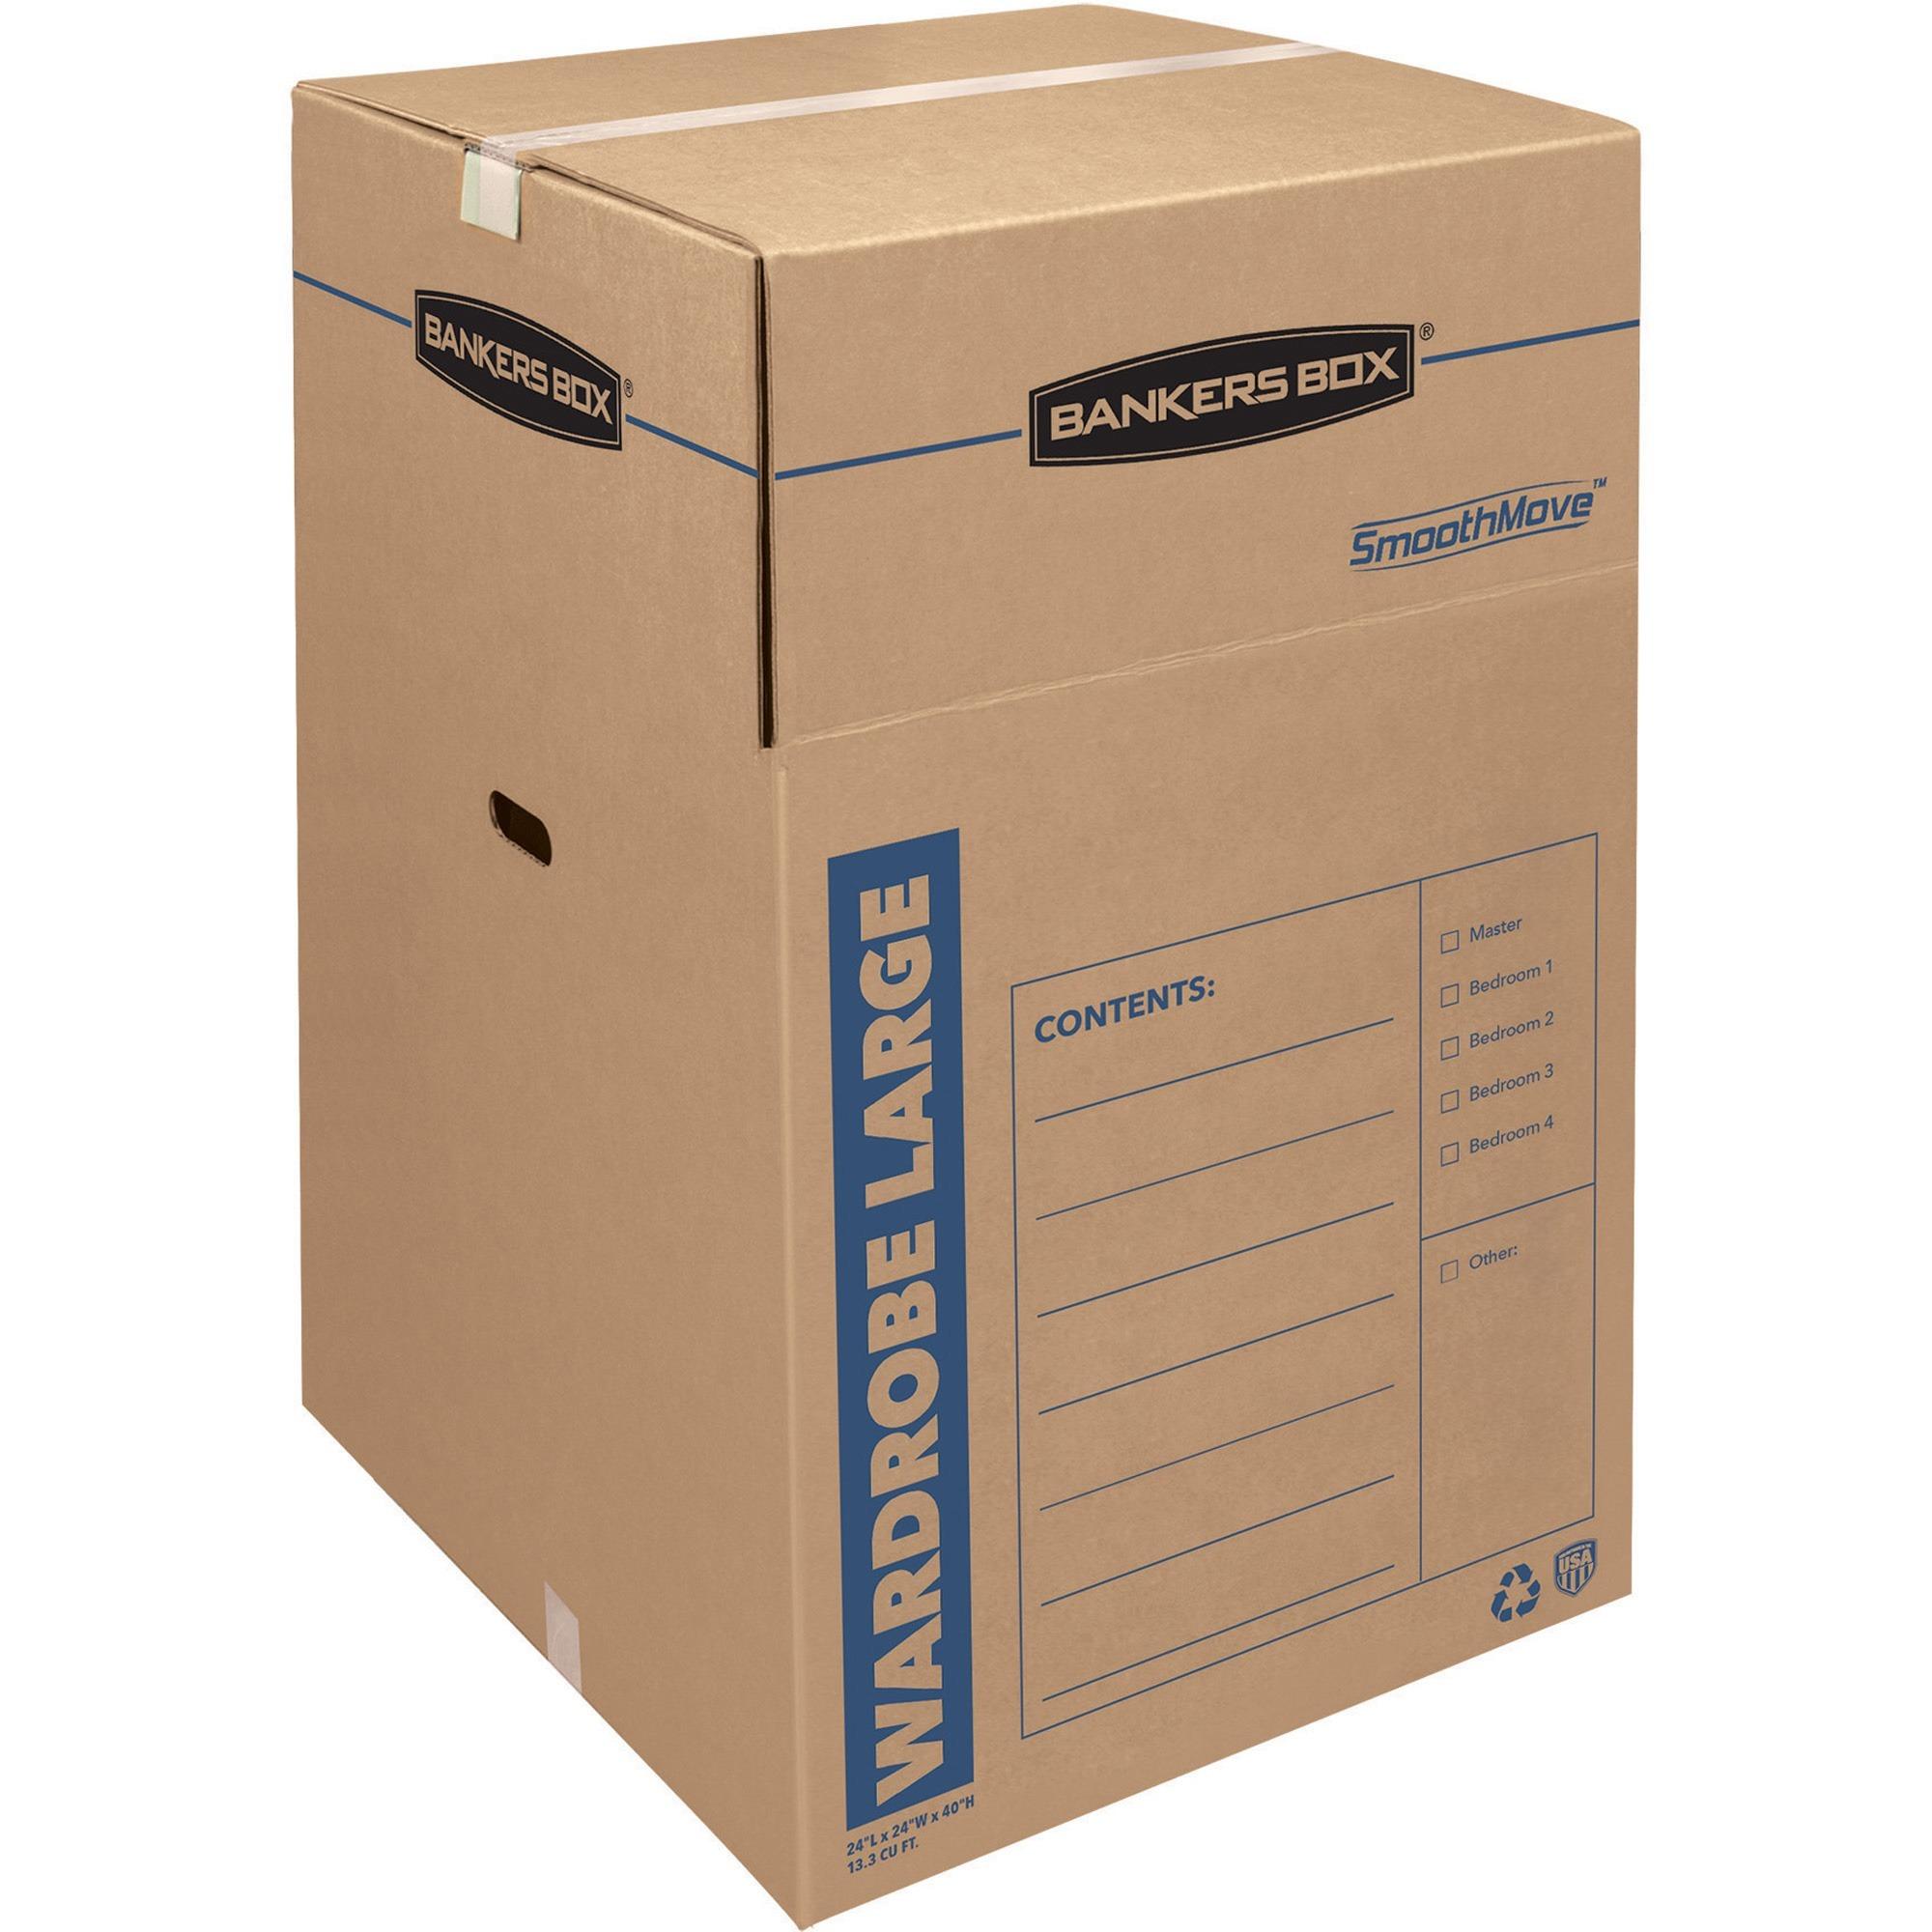 Product FEL Bankers Box SmoothMove™ Wardrobe Box